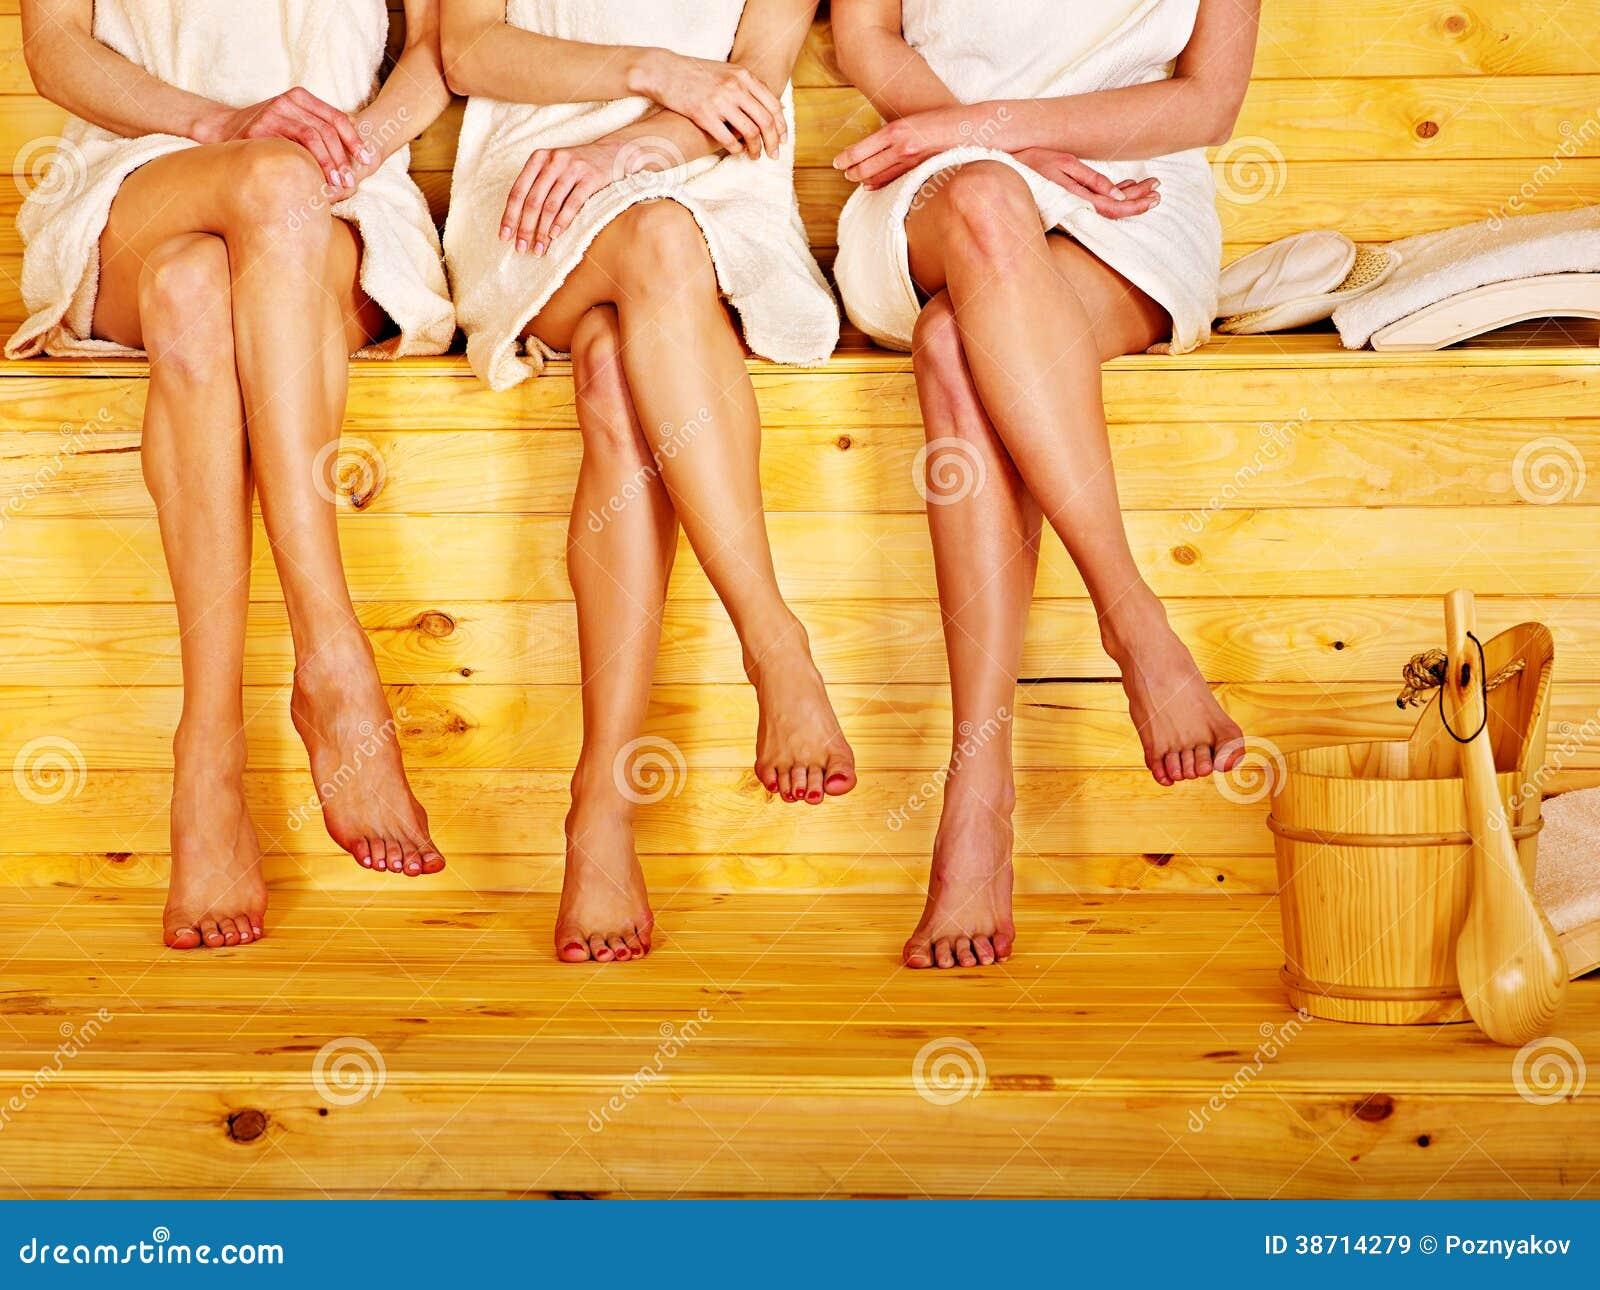 Small group girl in sauna.